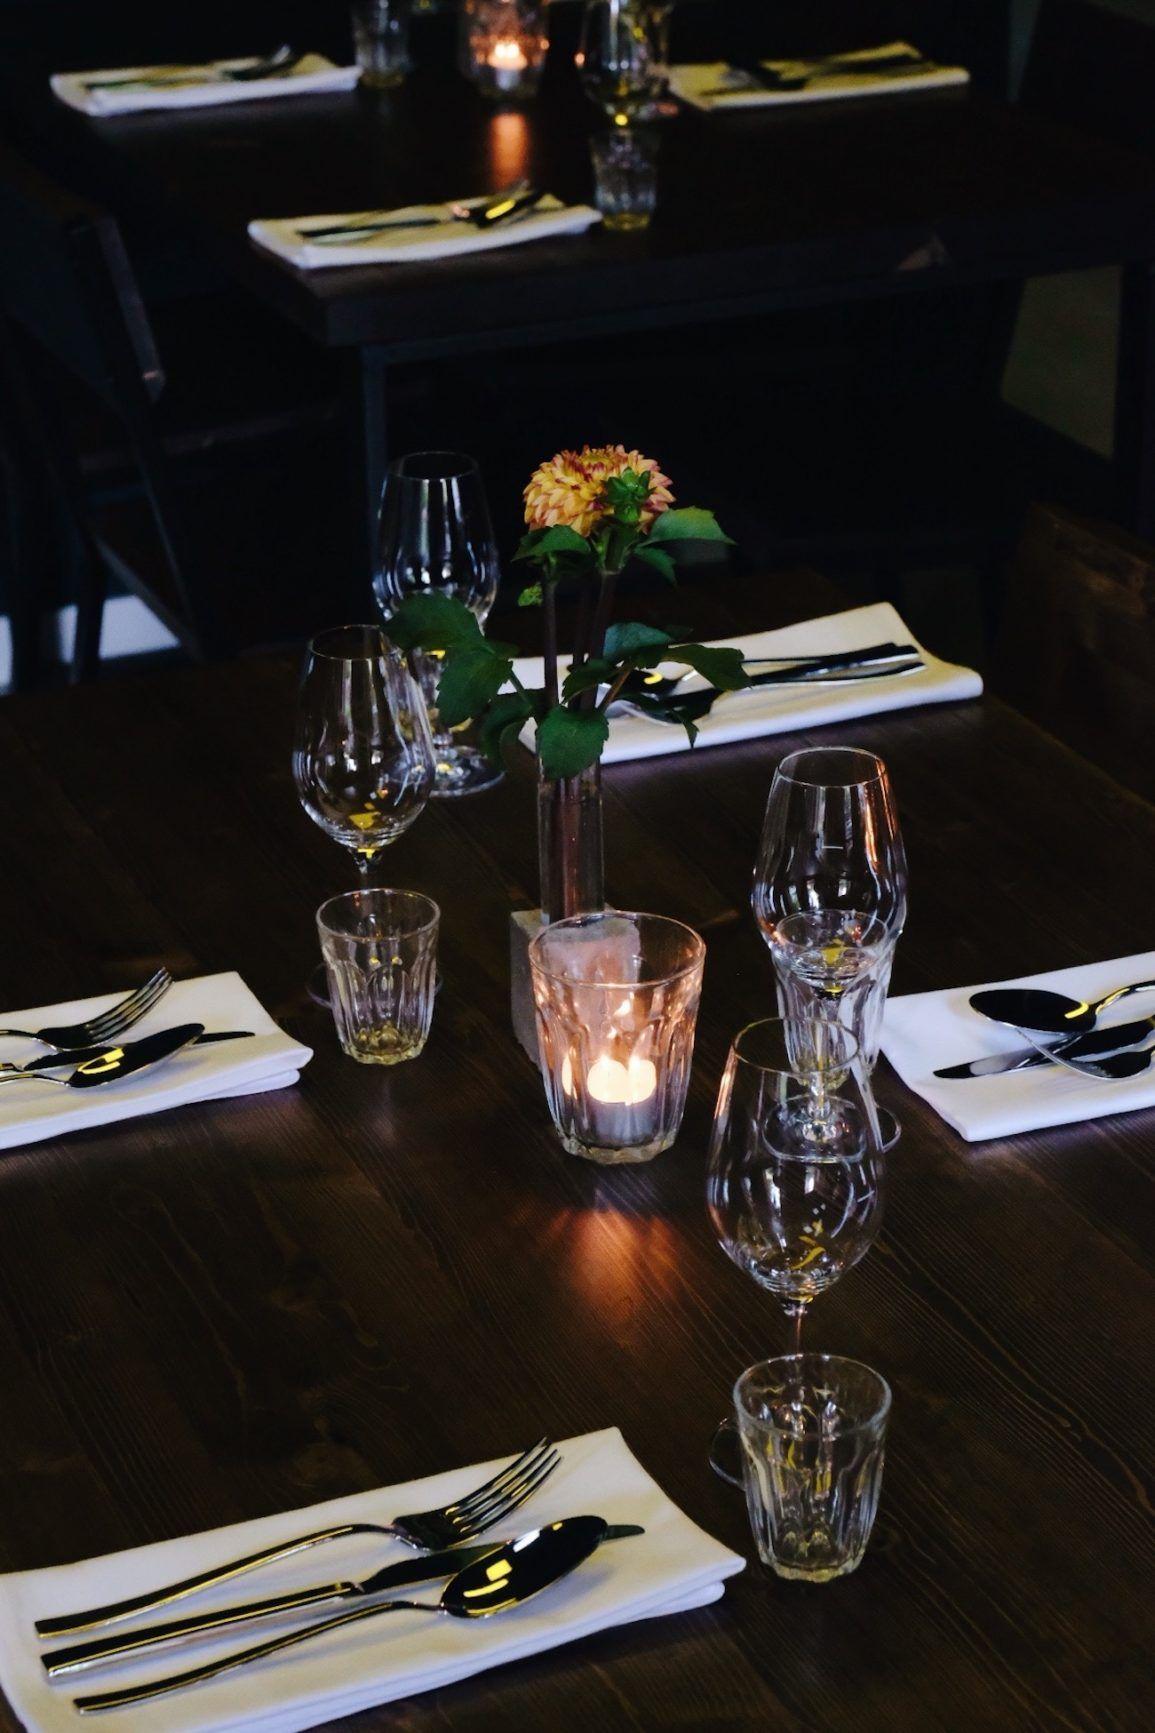 About Fuel, Foodblog, Leckerbissen, Bonvivant, Cocktail-Bistro, Bar, Interior, Kerze